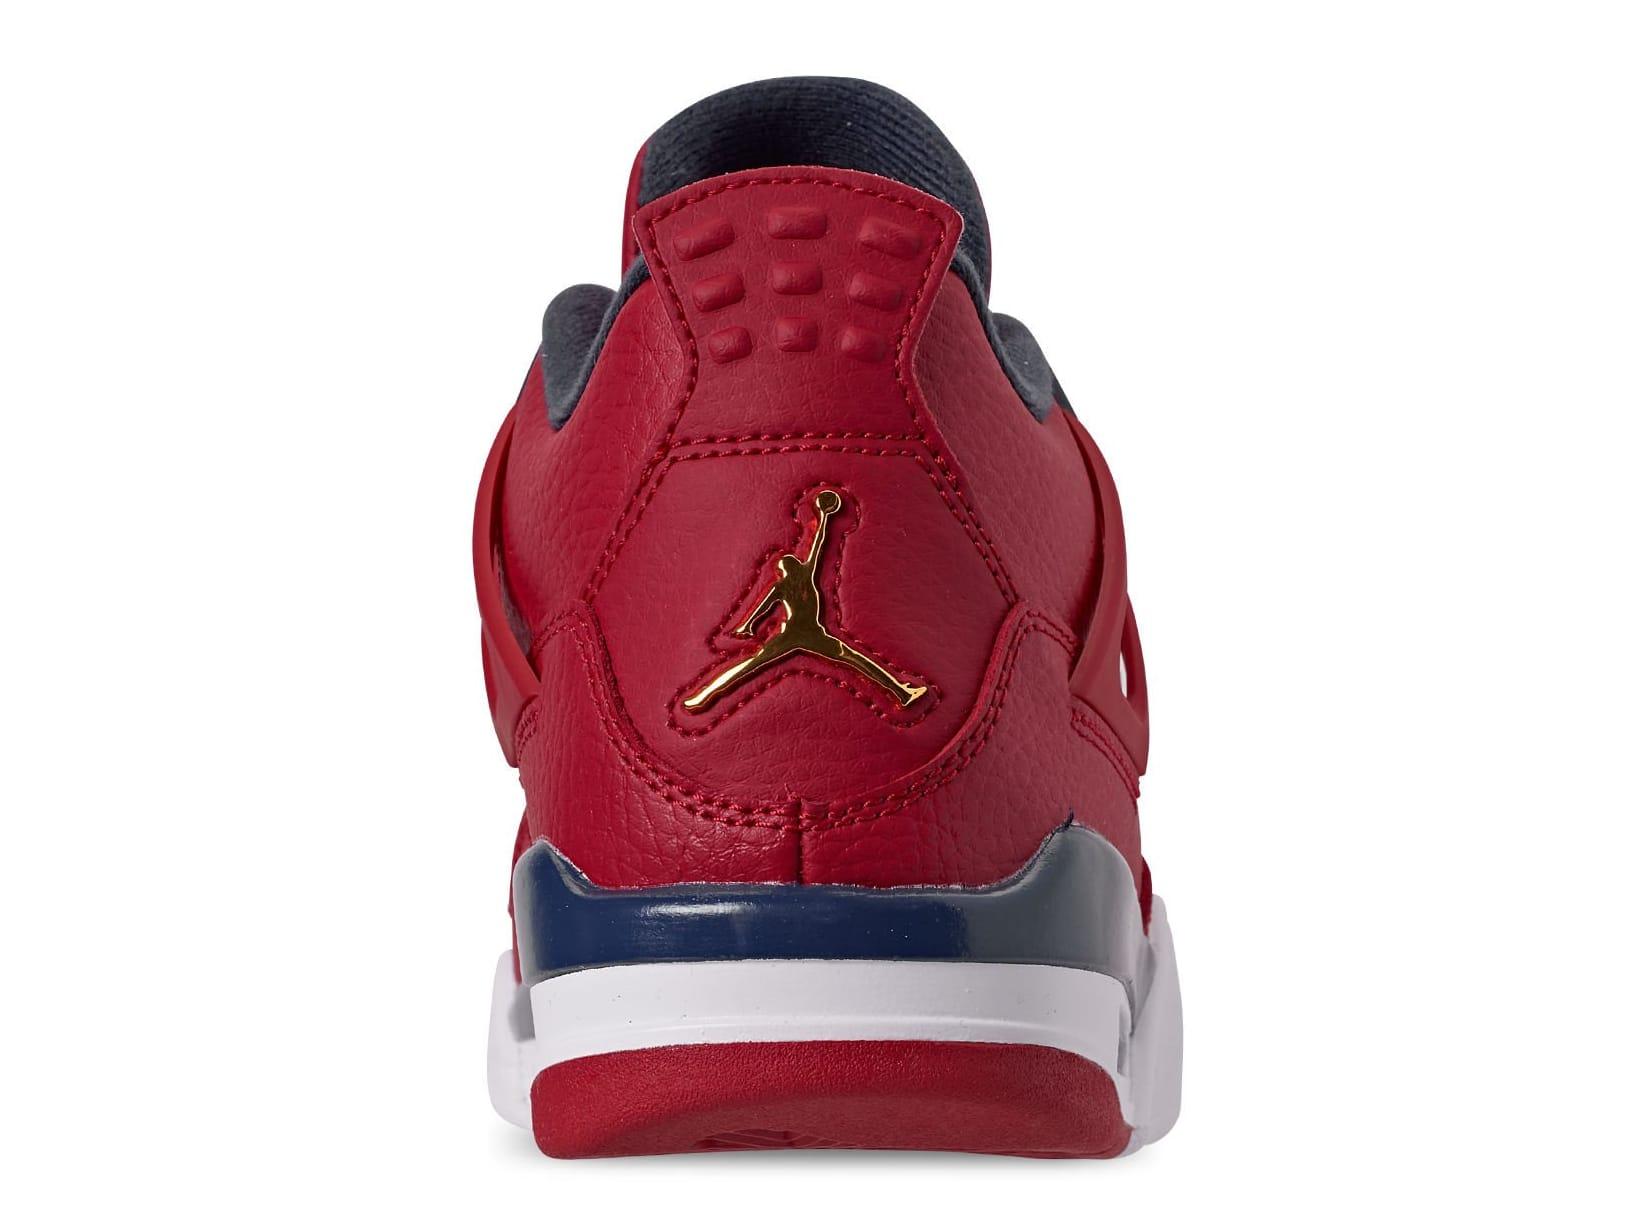 Air Jordan 4 Retro SE 'Fiba' Gym Red/White/Metallic Gold/Obsidian CI1184-617 (Heel)